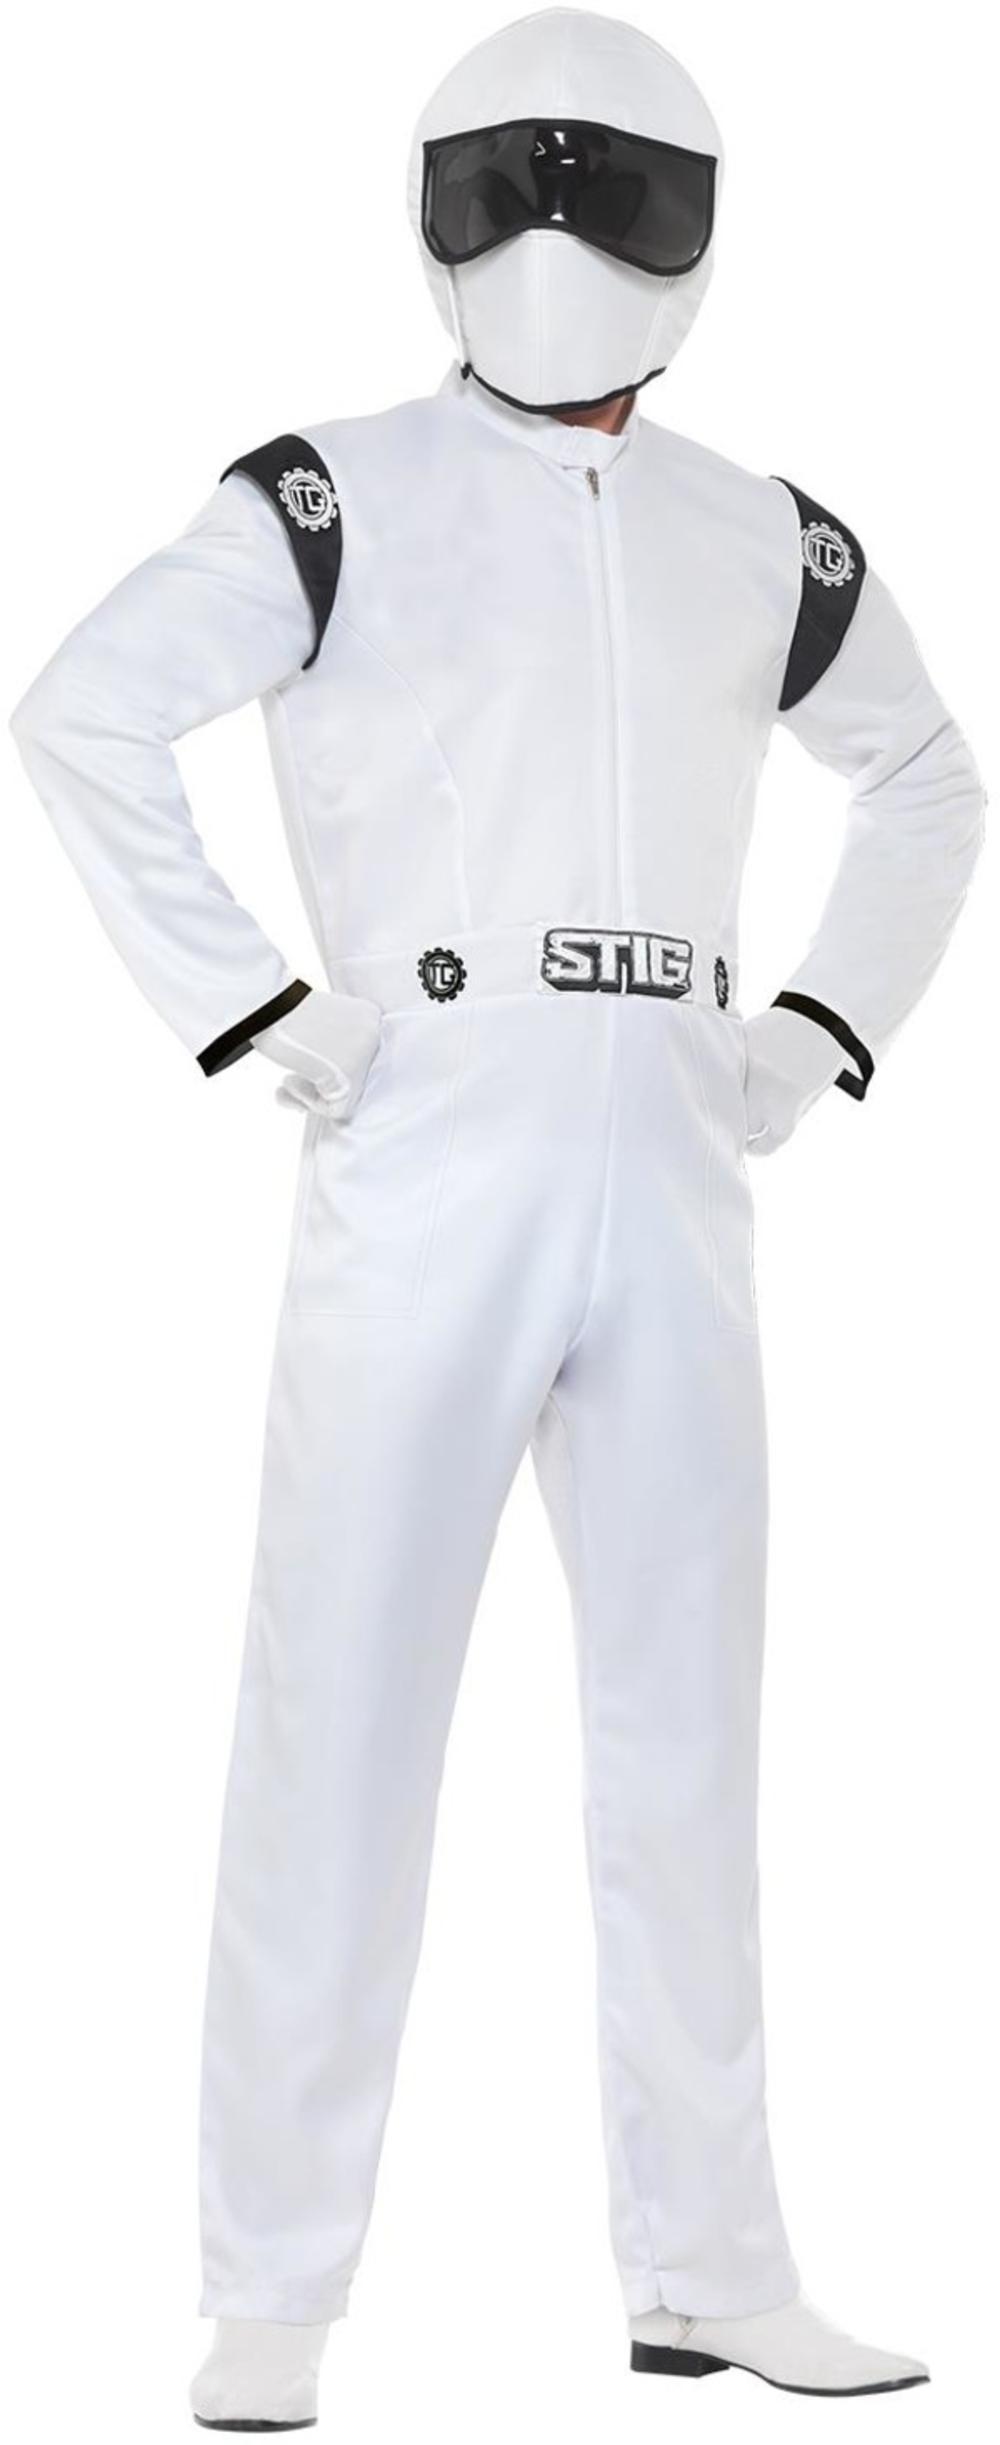 Top Gear The Stig Mens Costume